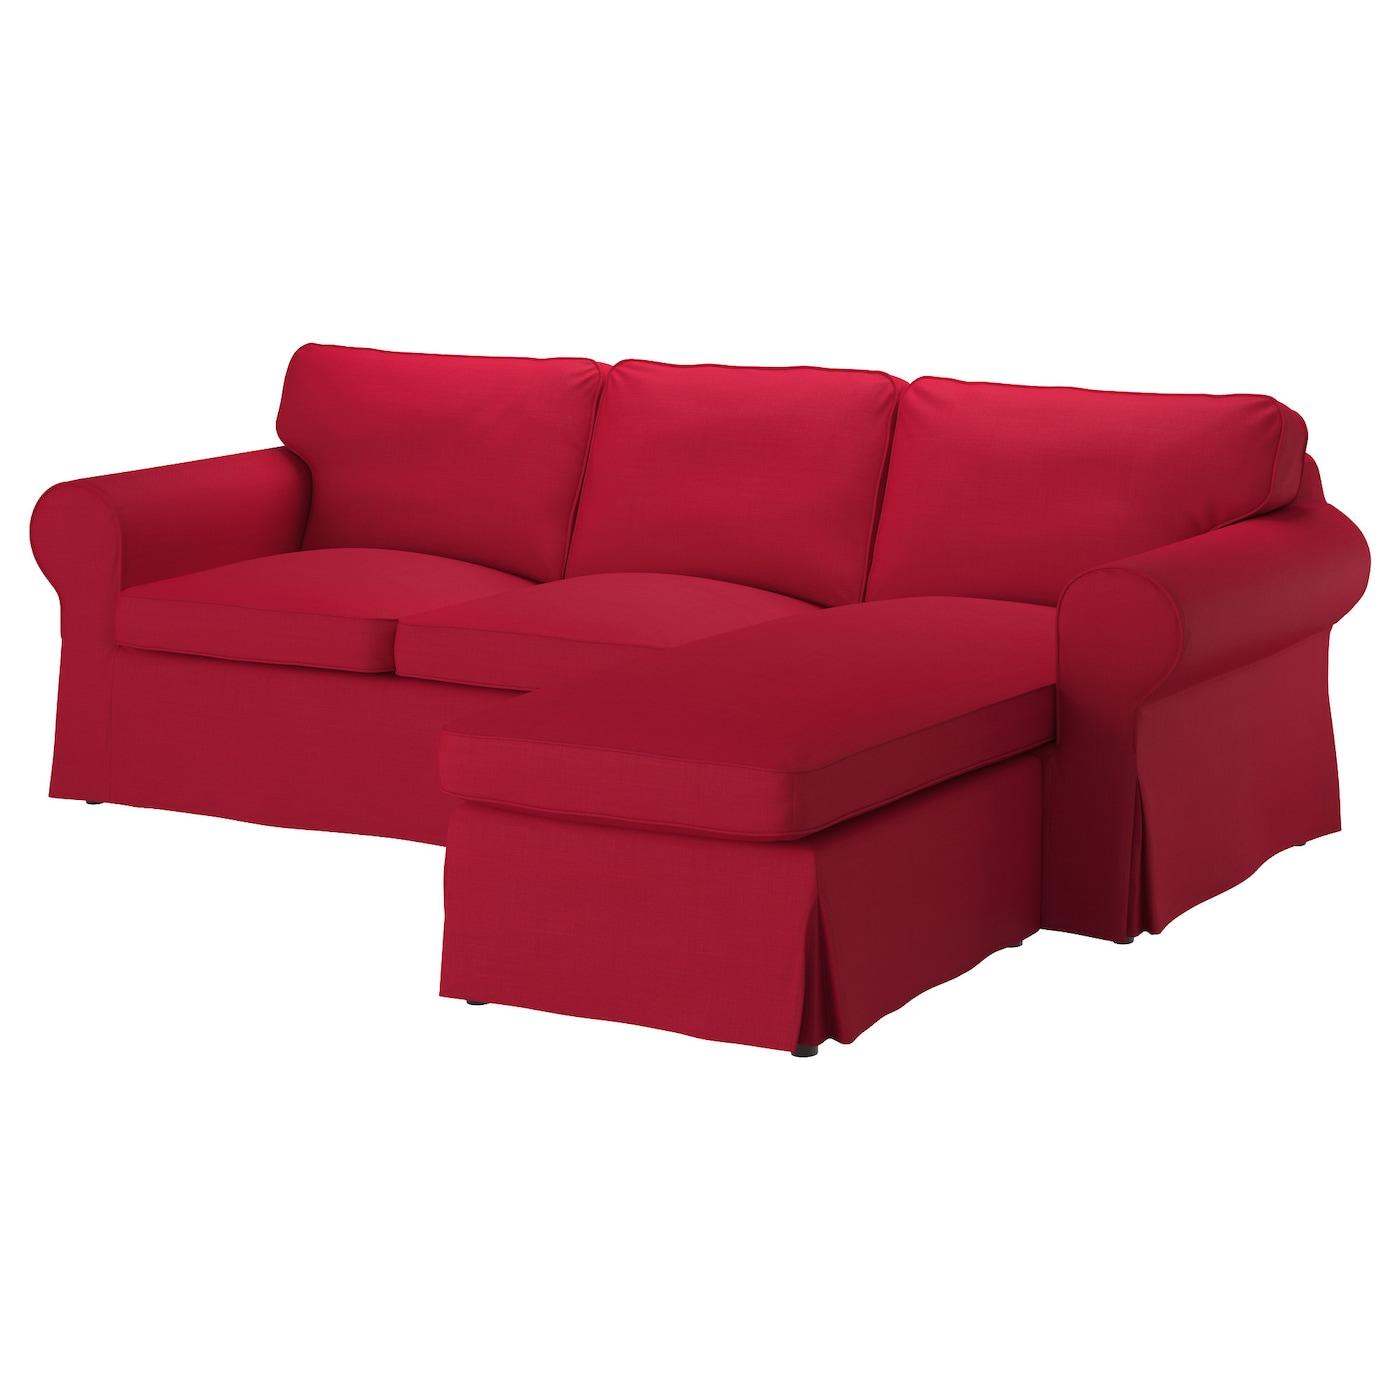 Ektorp two seat sofa and chaise longue nordvalla red ikea - Fundas para sofa chaise longue ...